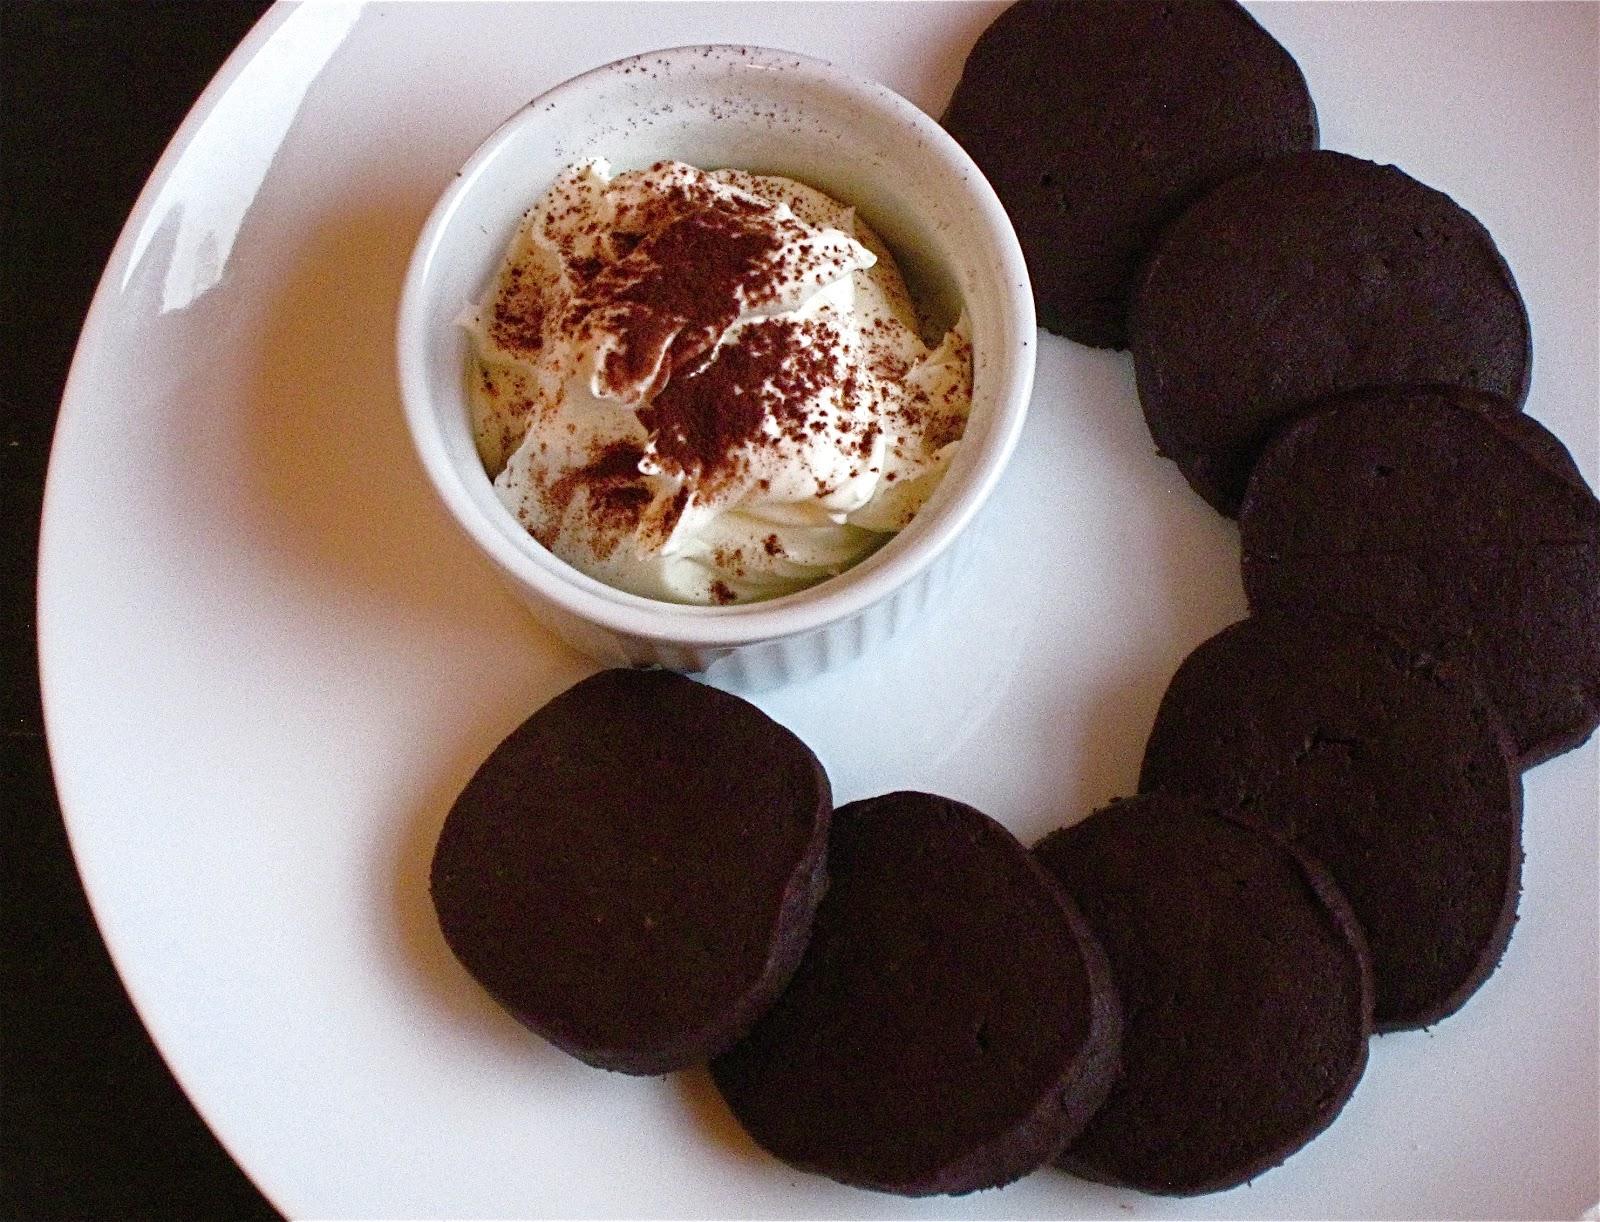 KITCHEN FIDDLER : Salt-and-Pepper Cocoa Shortbread Cookies